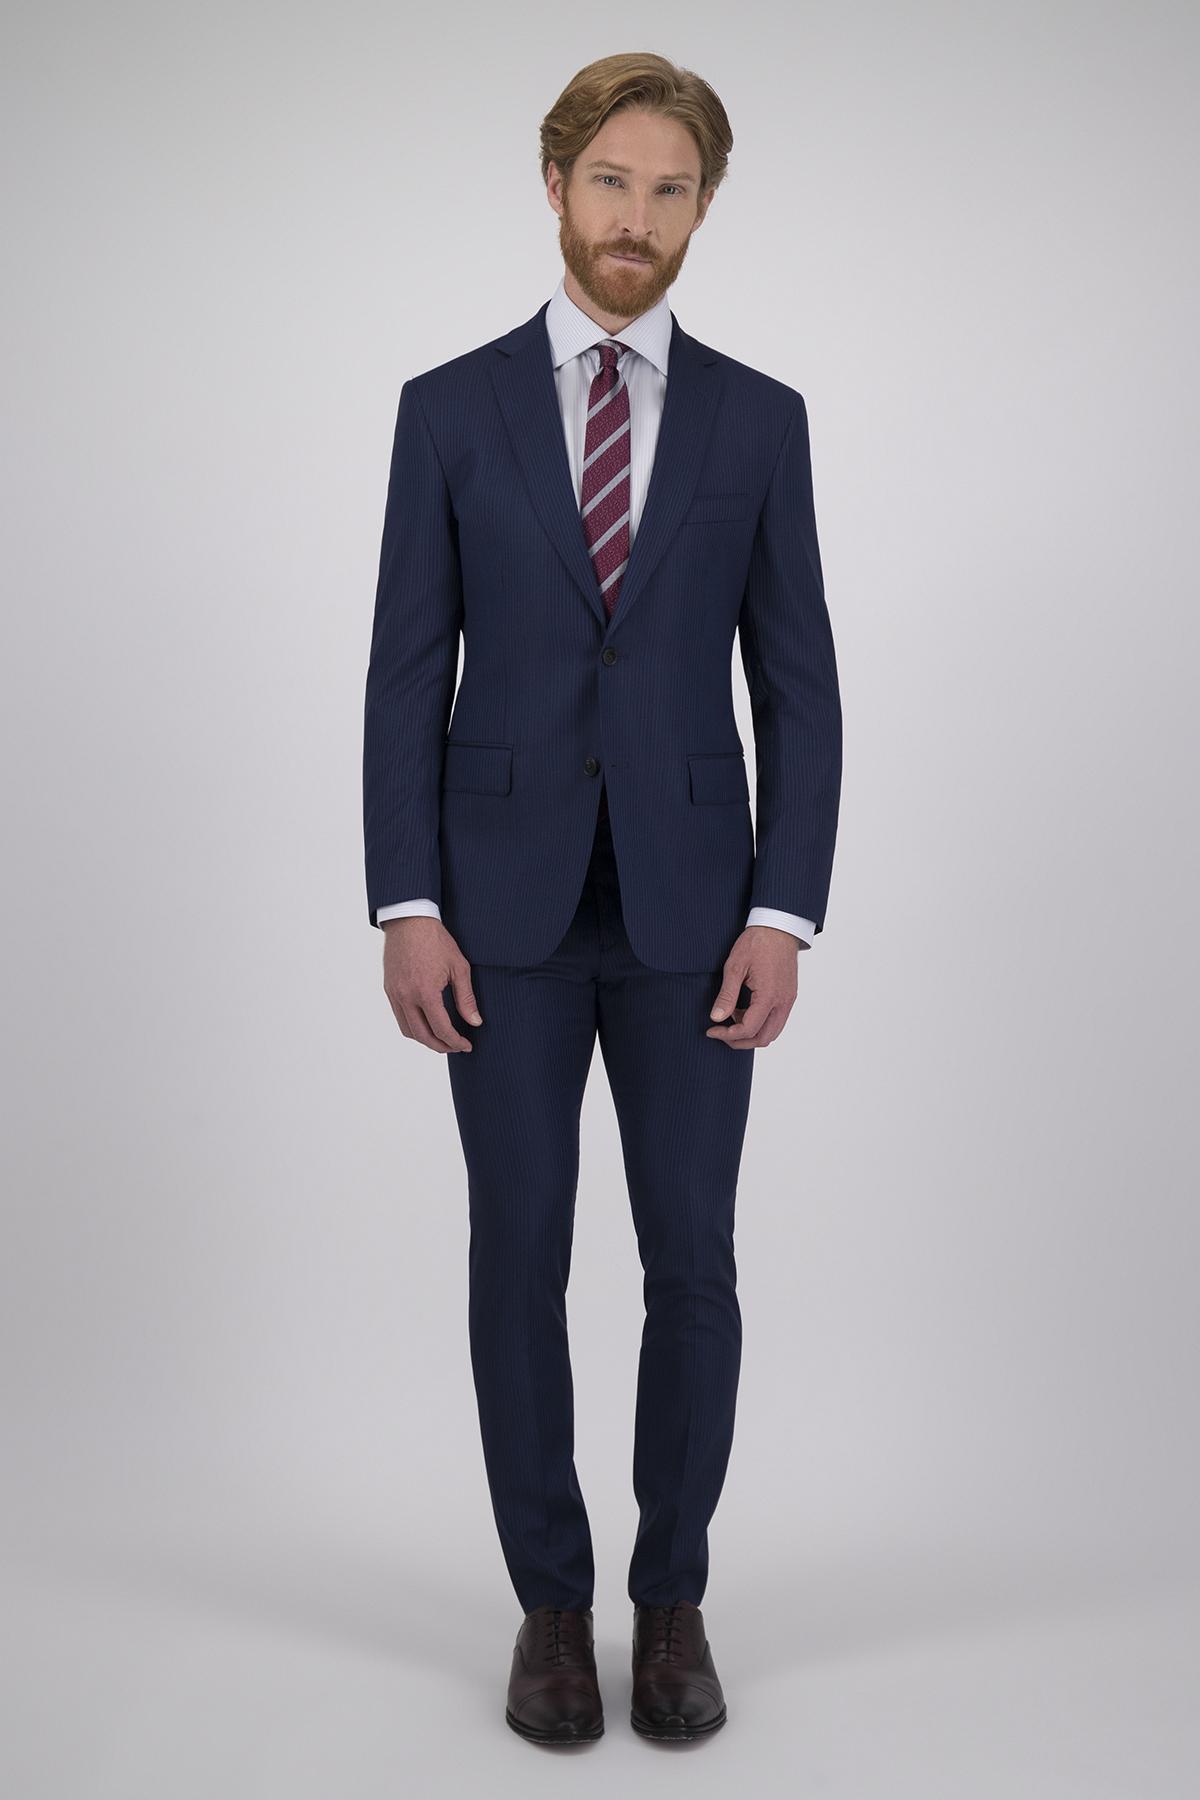 Traje Calderoni Couture Azul a Rayas con Tejido super 150´s Lana 100% Corte Regular, 2 Piezas.